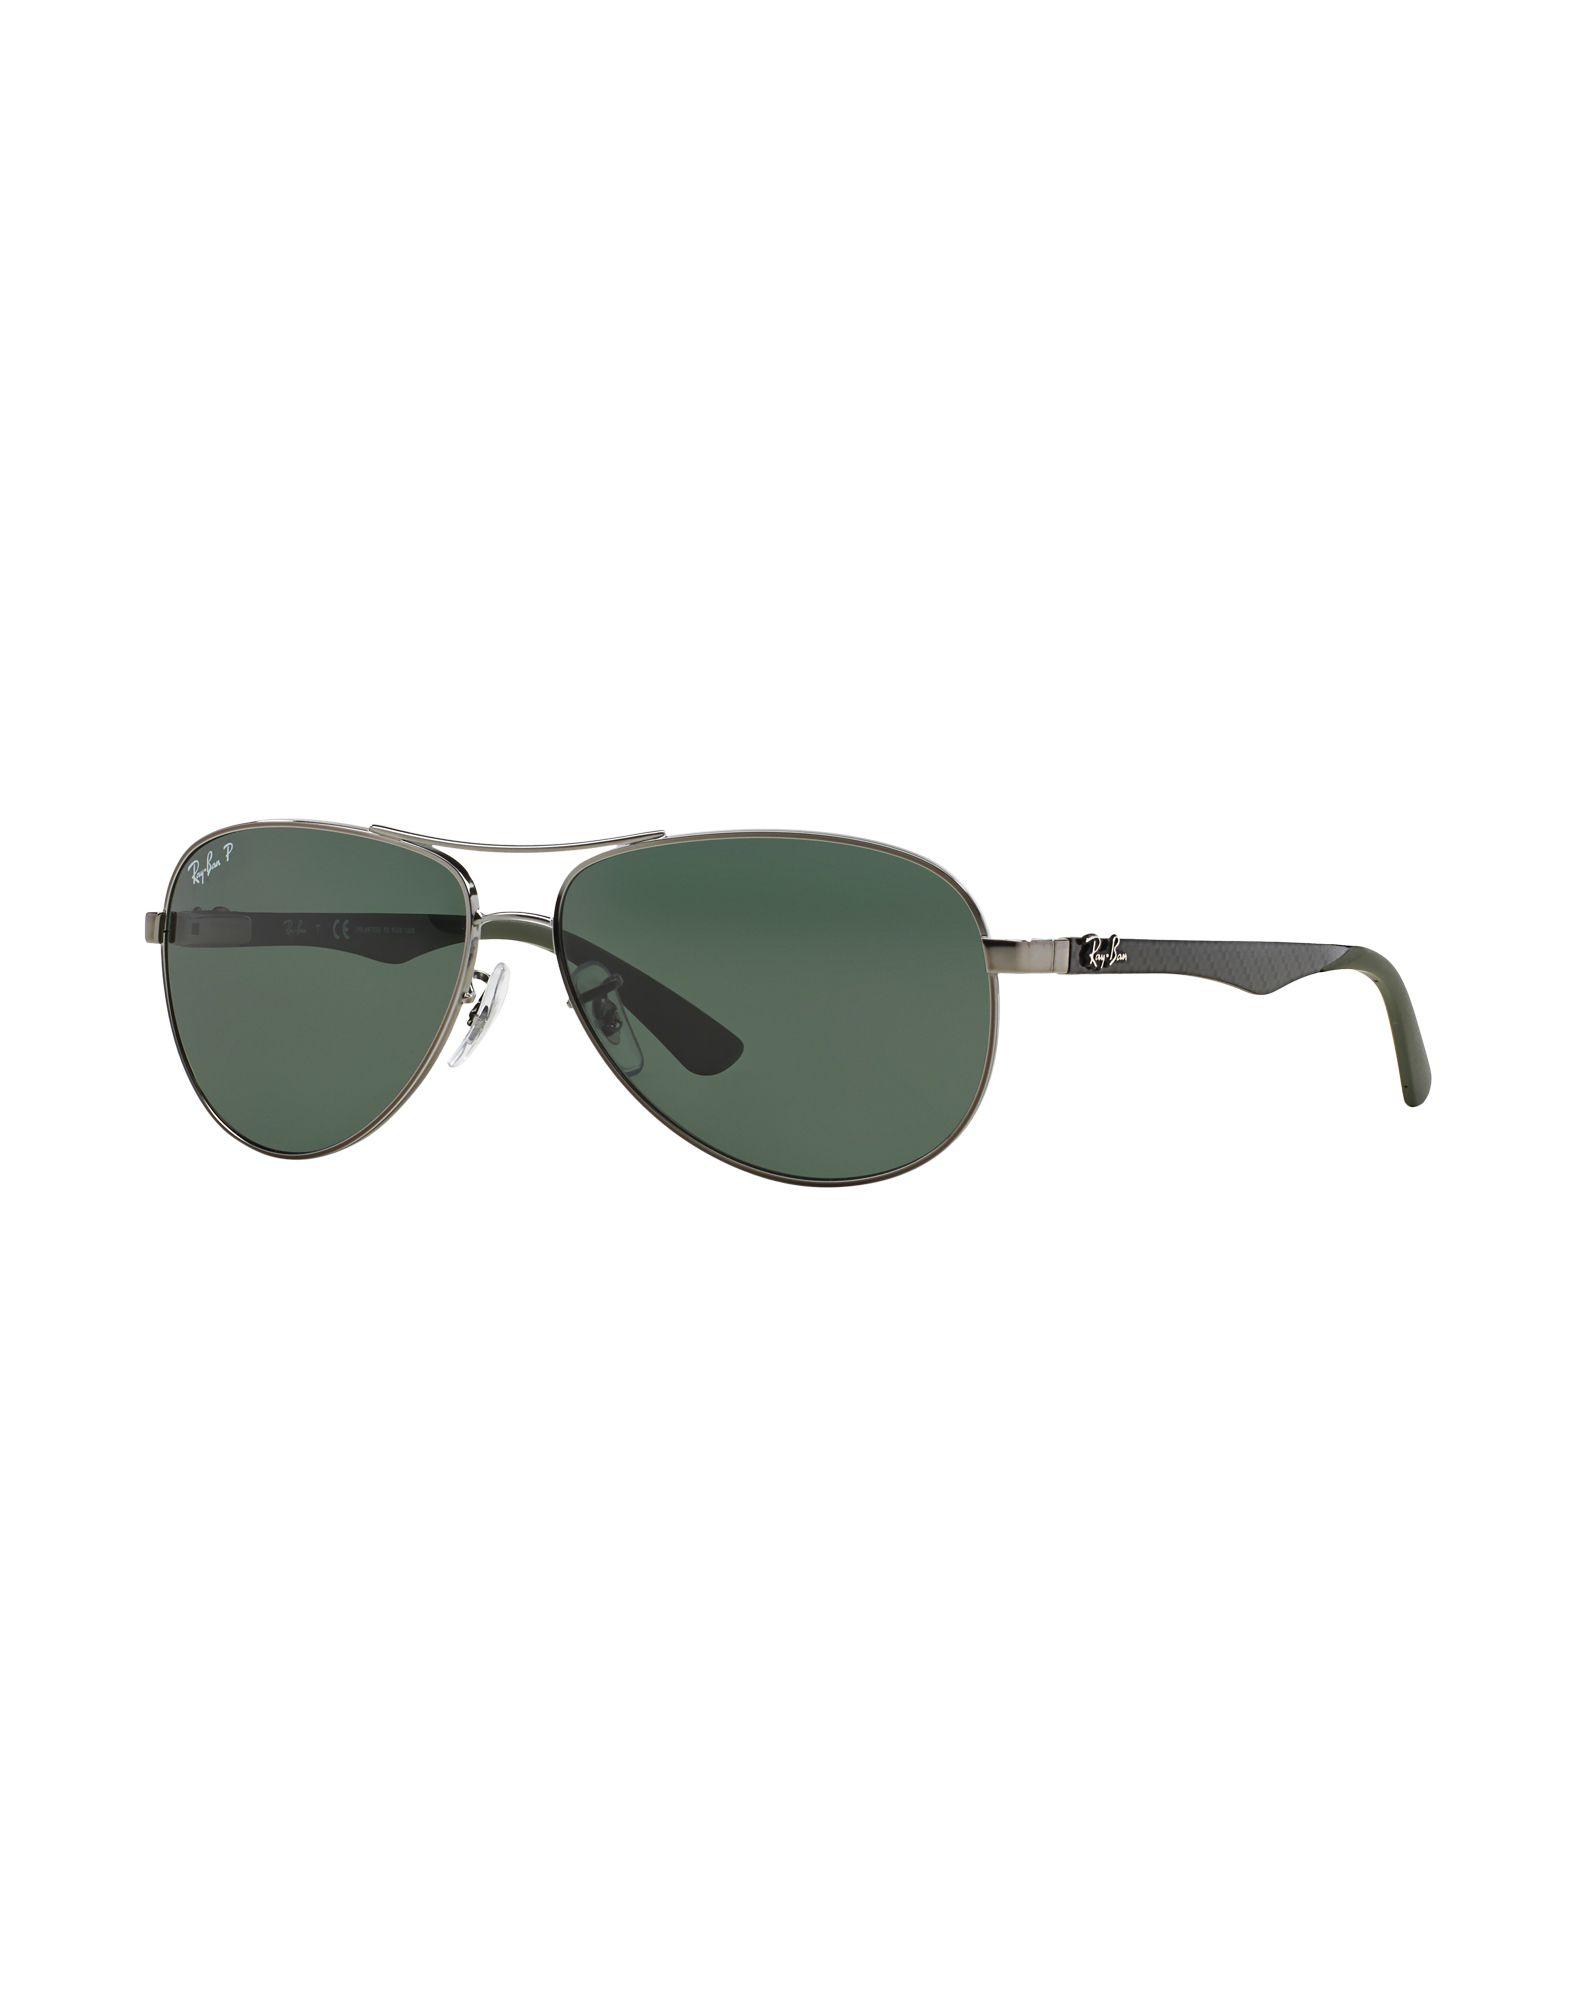 gatorz sunglasses  gatorz sunglasses